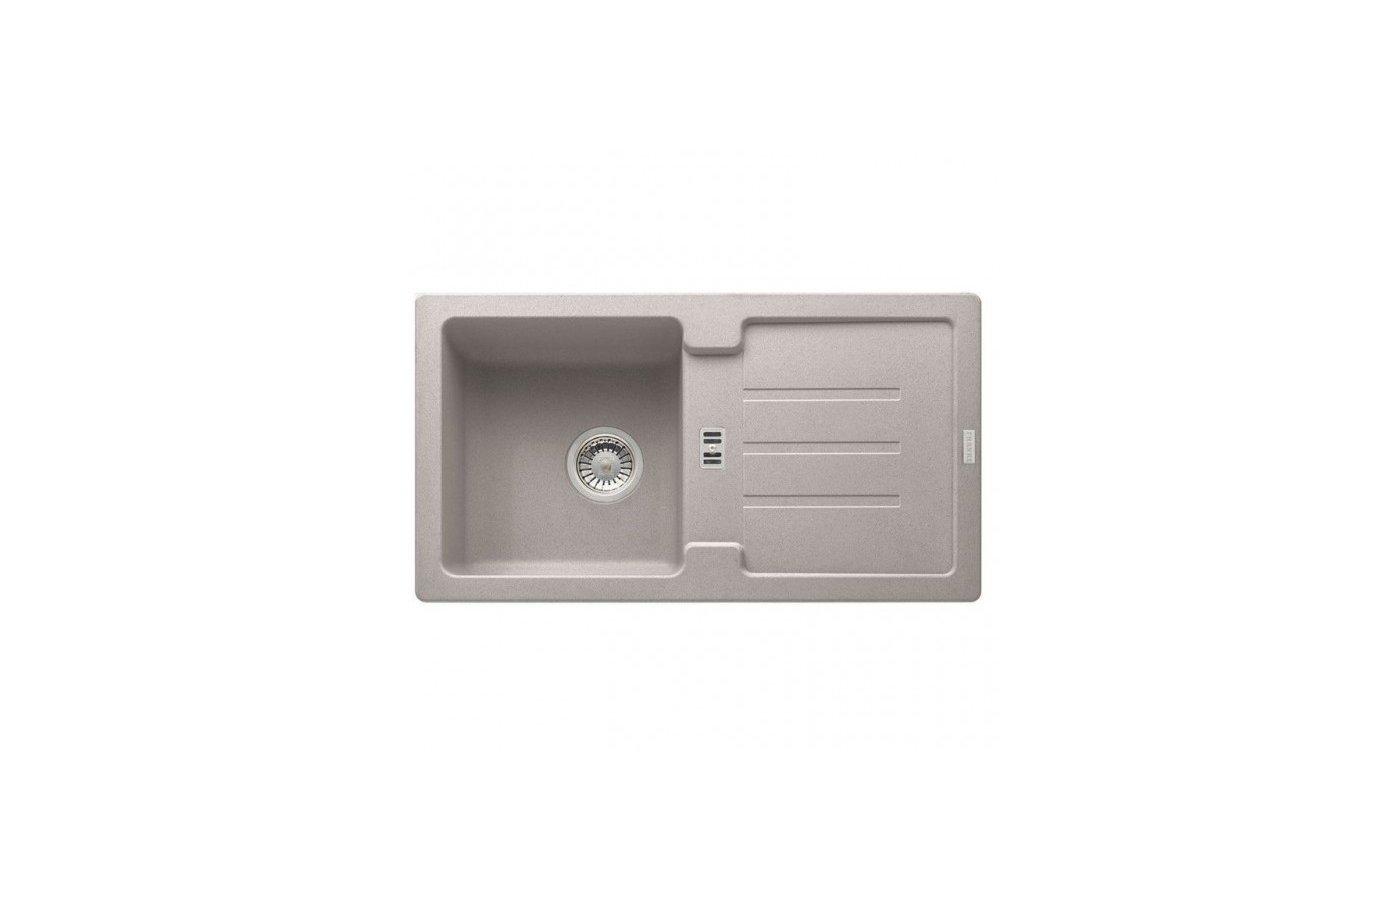 Кухонная мойка FRANKE Strata 614-78 серебристый